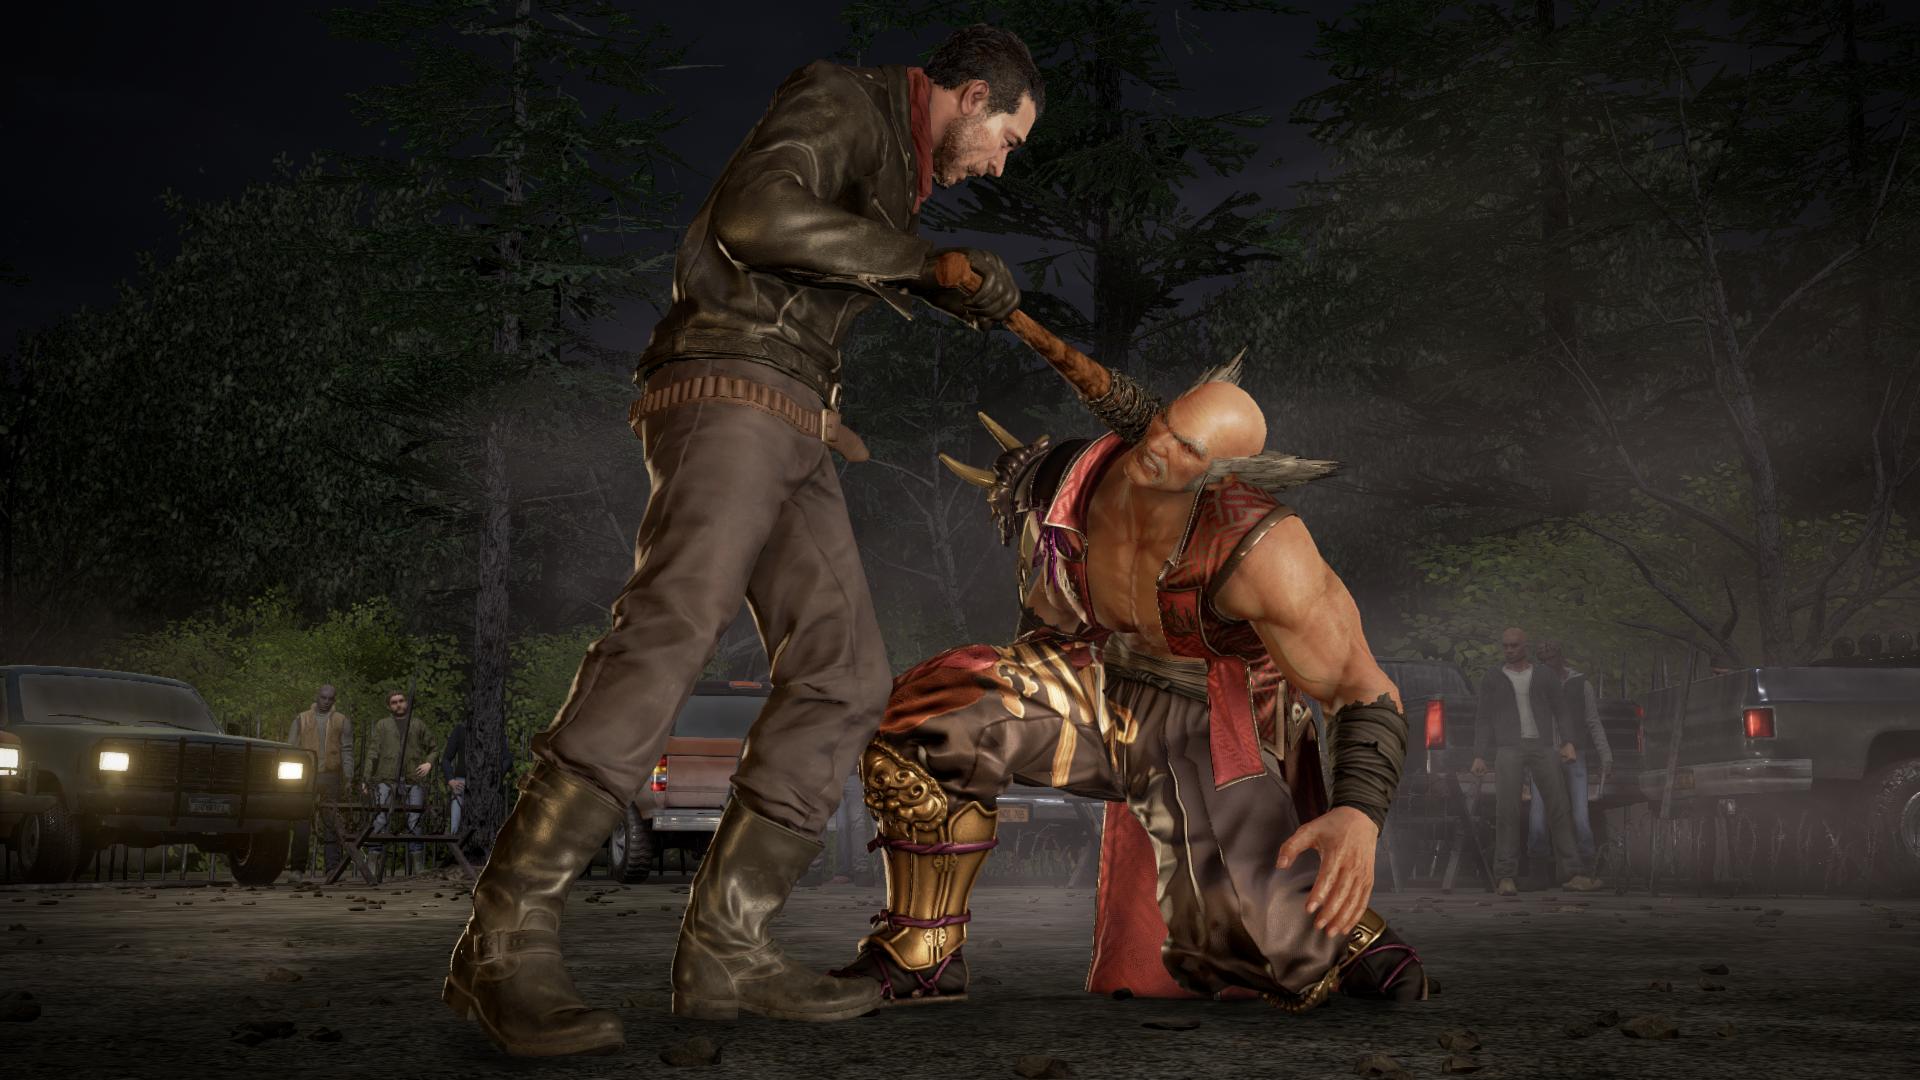 Gallery Tekken 7 Julia Chang Negan Gameplay Screenshots News Avoiding The Puddle